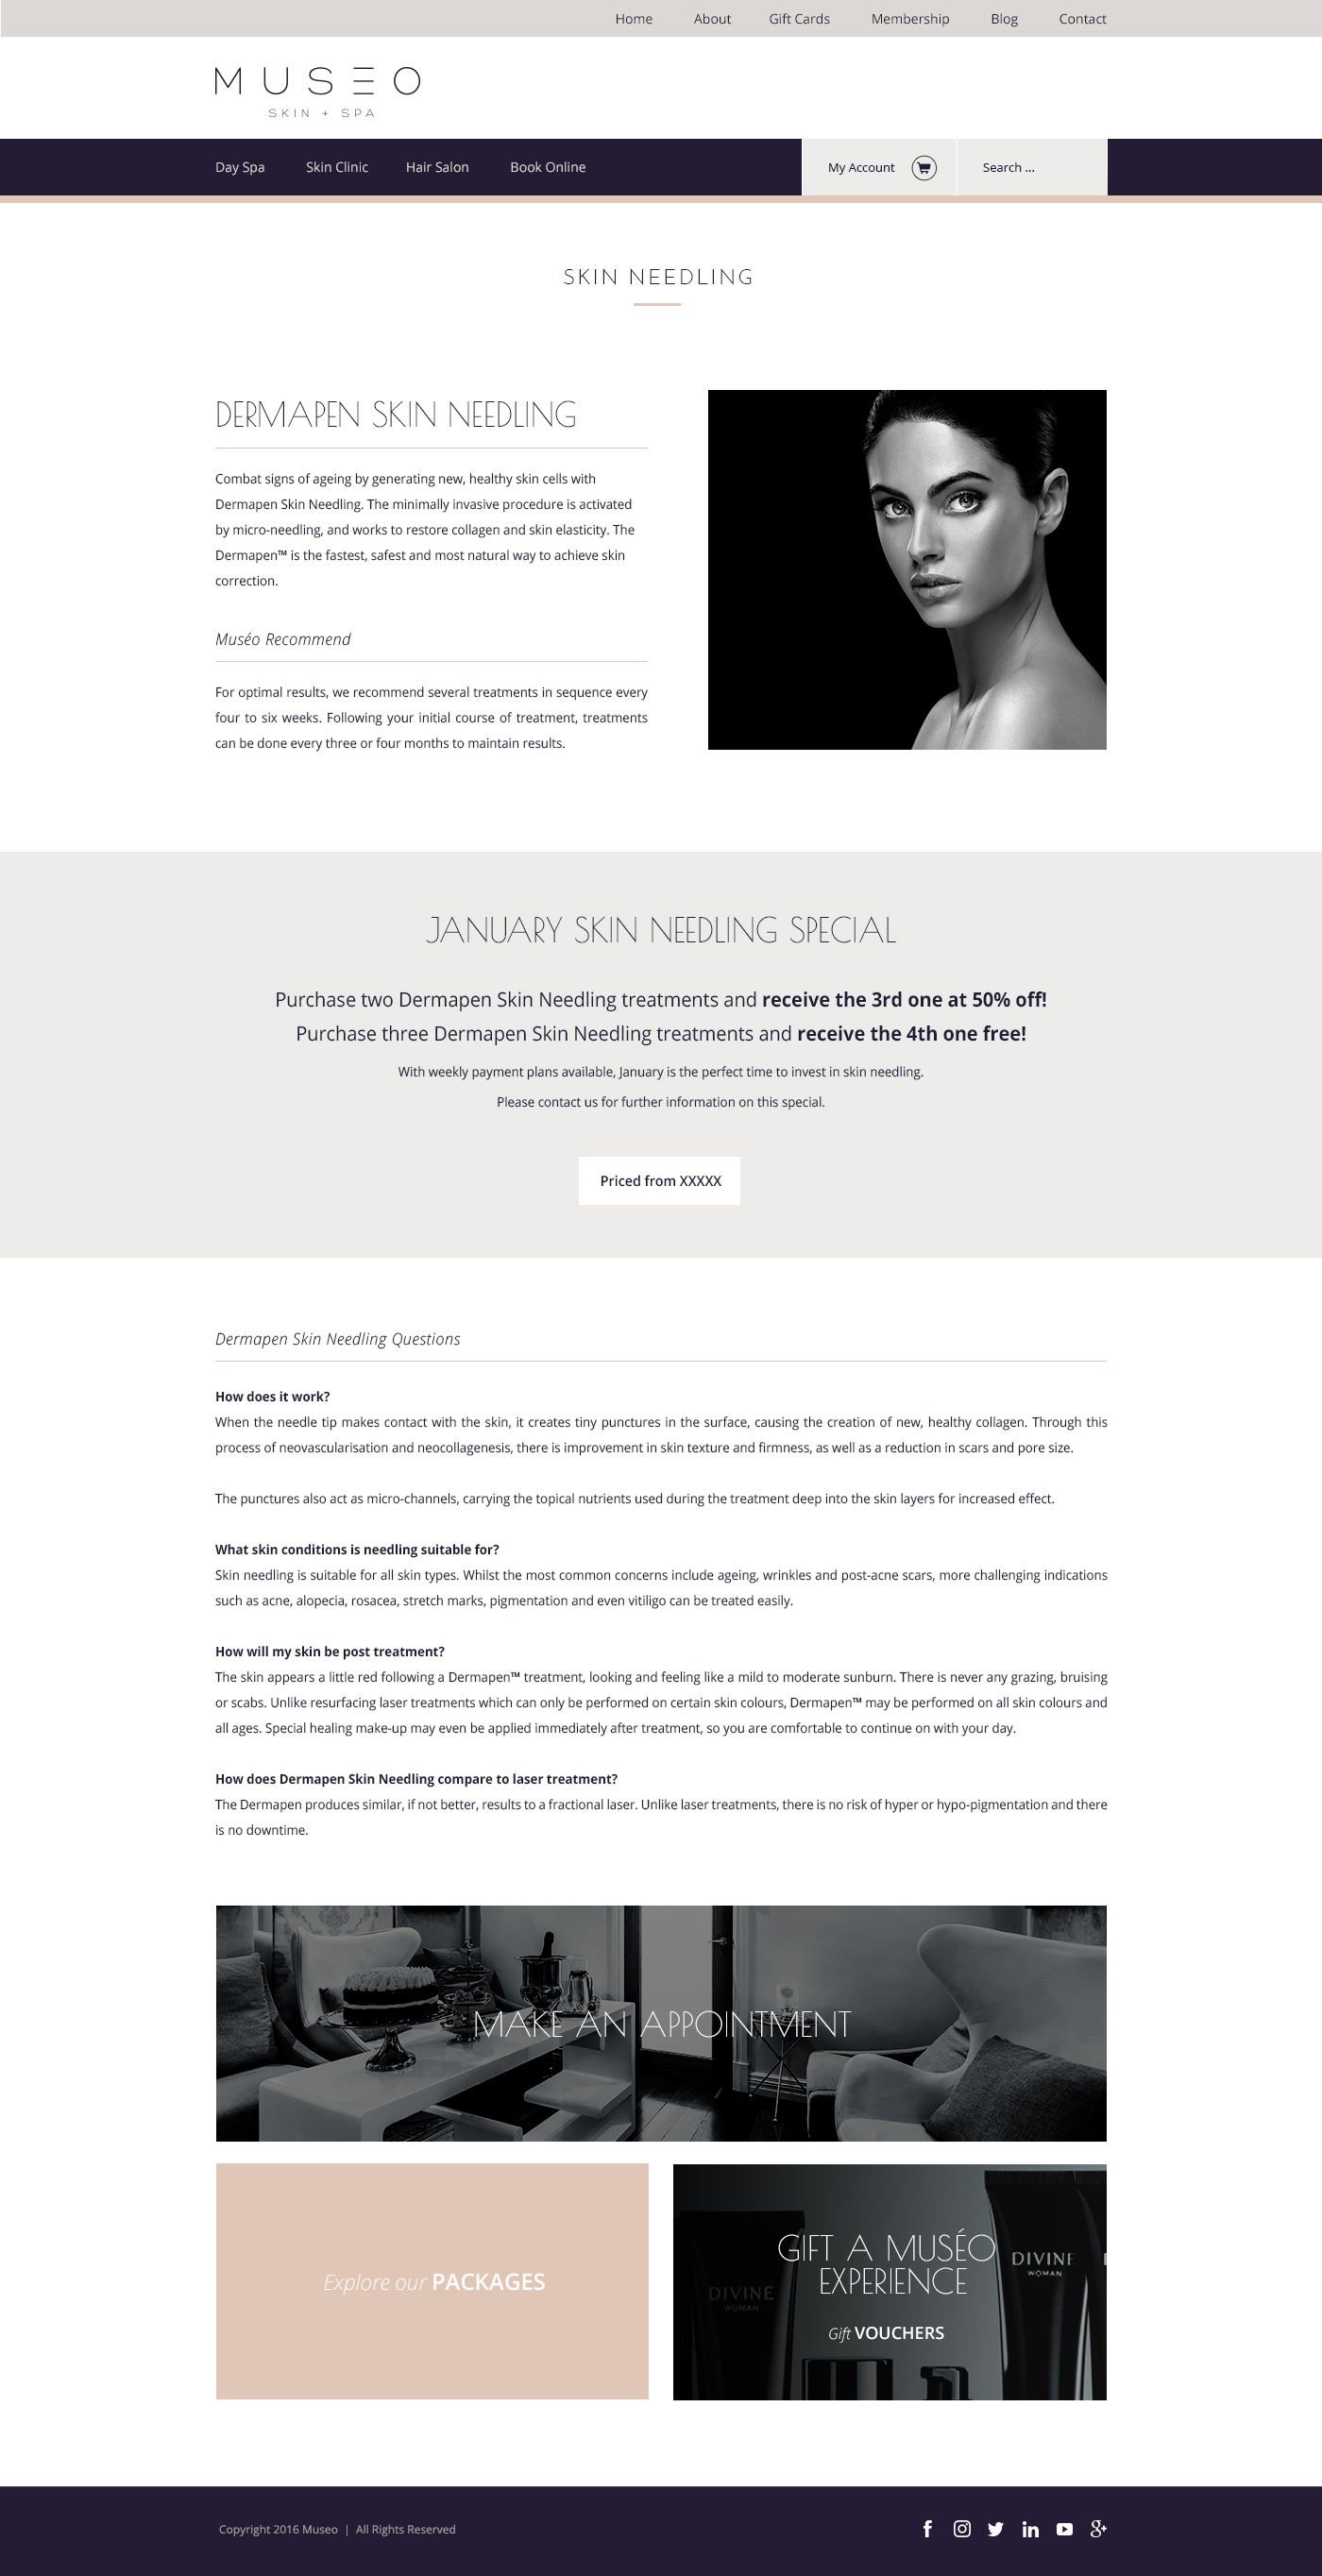 MUSEO  - Skin Clinic - Skin Needling -1.jpg